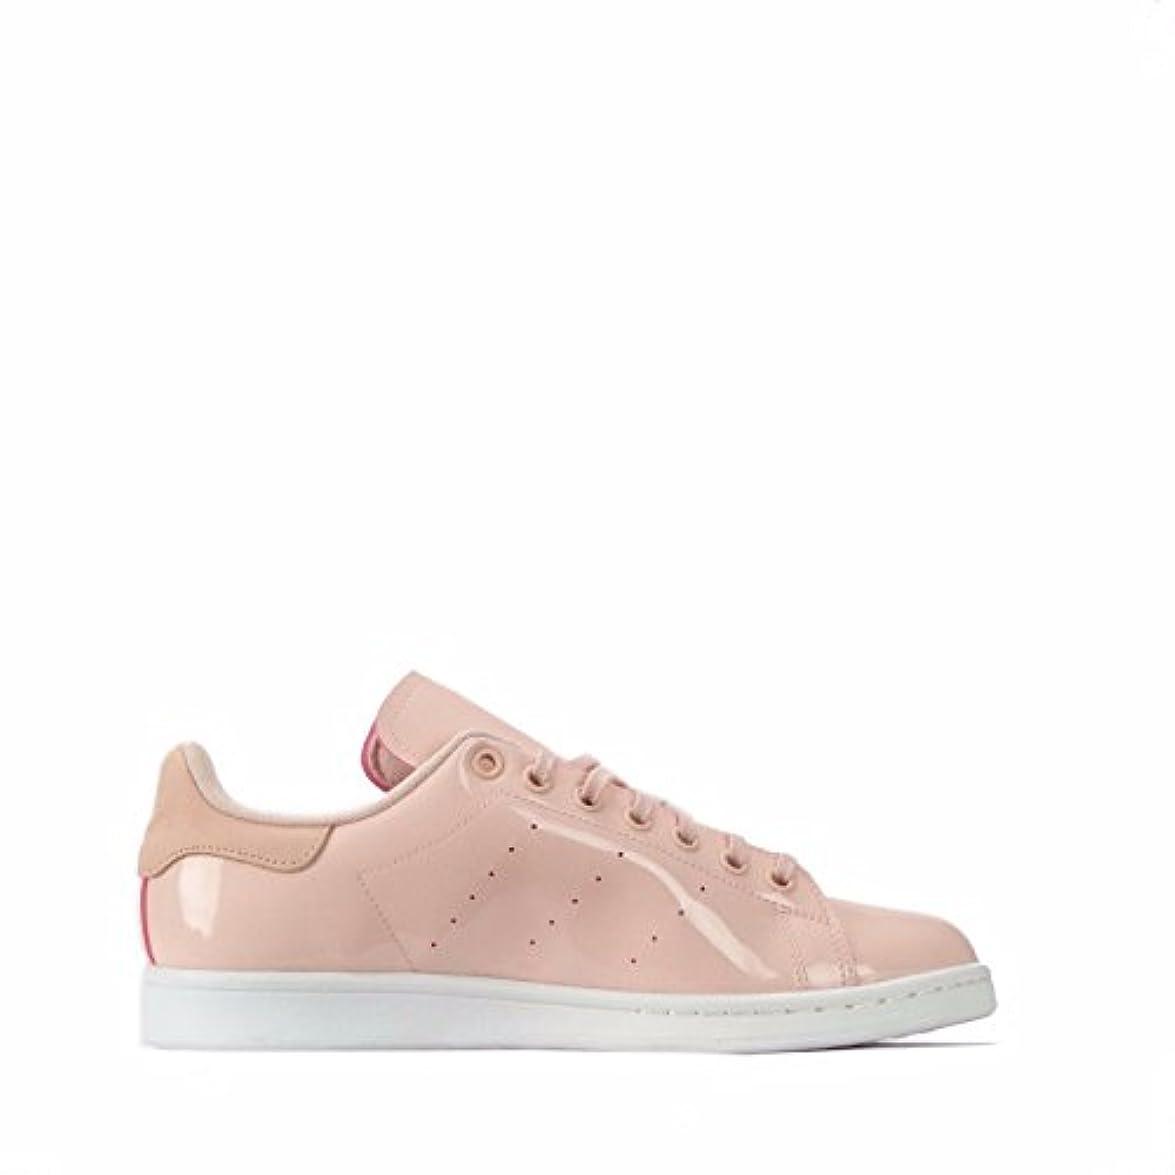 Adidas Originals Stan Smith Sneaker Donna Multicolore Pink pink white 37 1 3 Eu